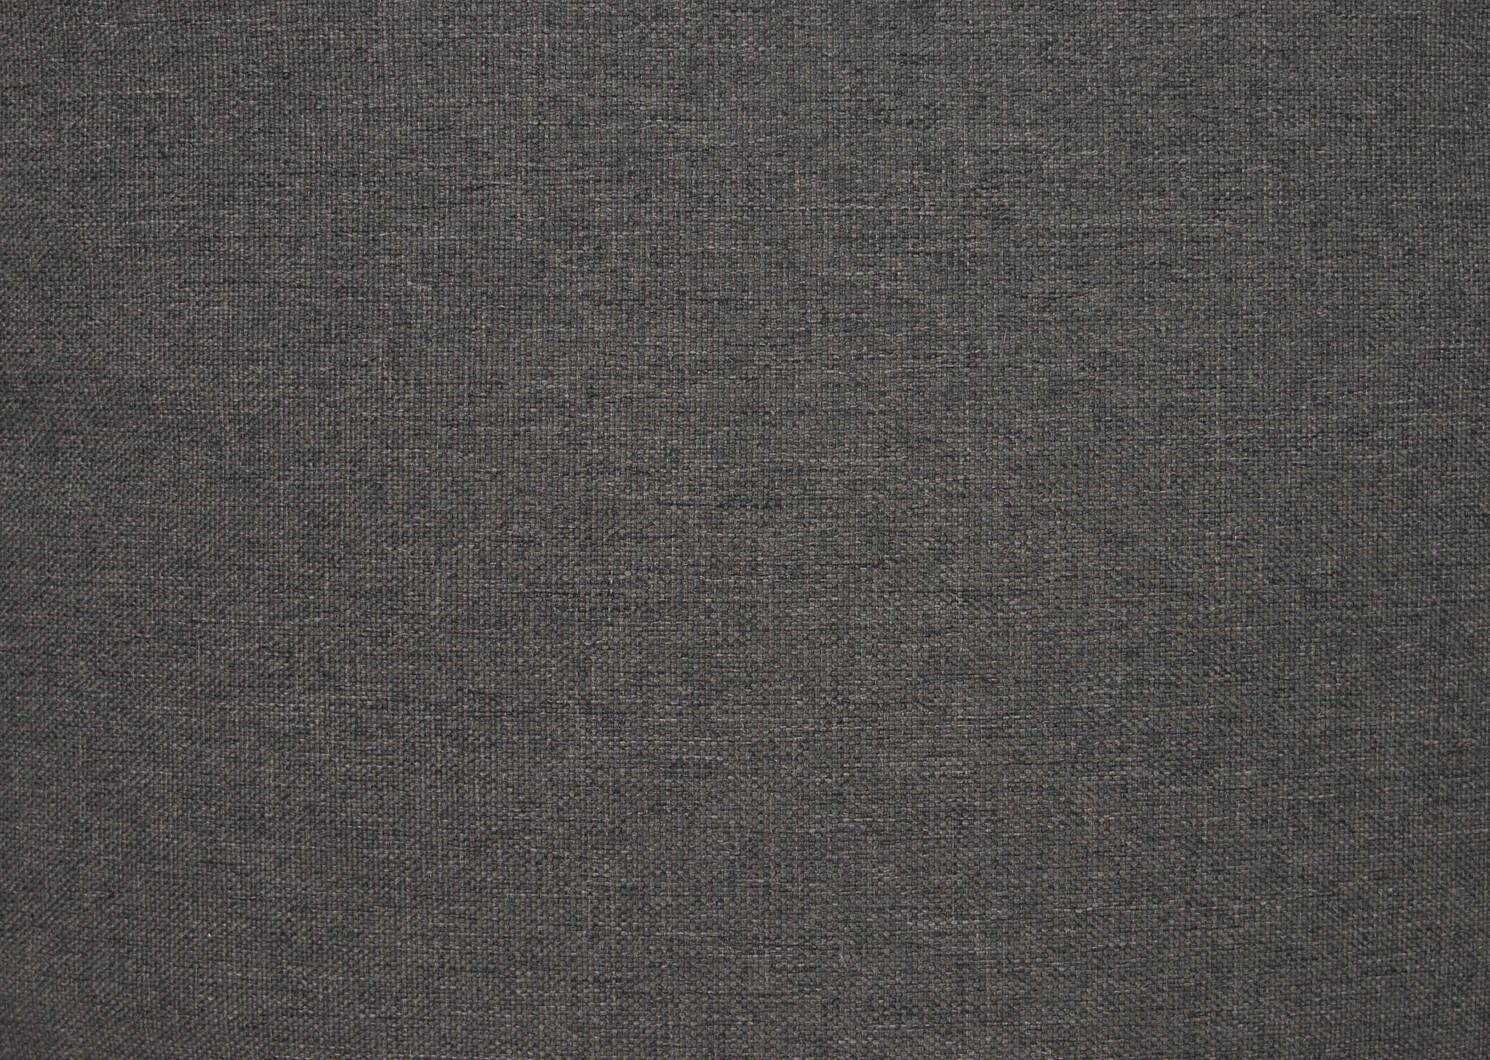 Fauteuil Torrance -Kobe graphite